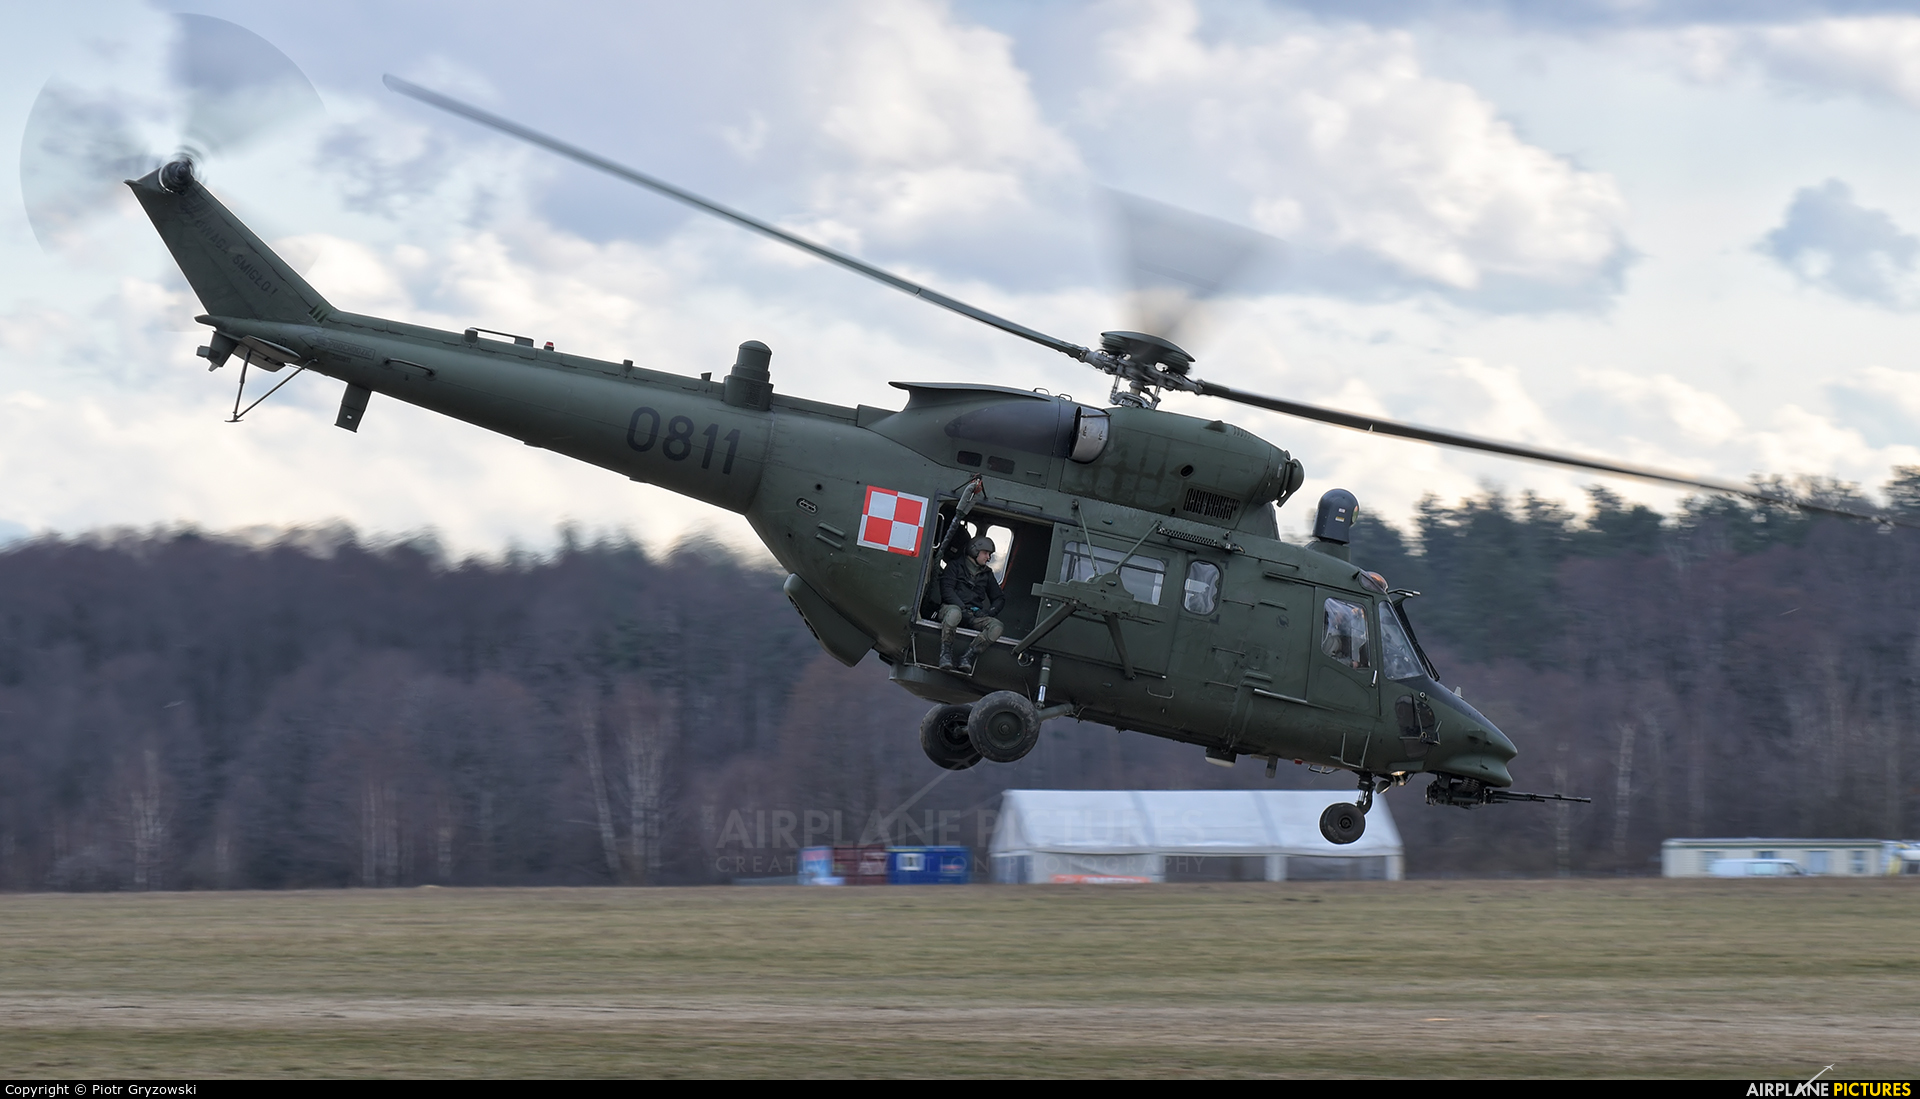 Poland - Army 0811 aircraft at Rybnik - Gotartowice